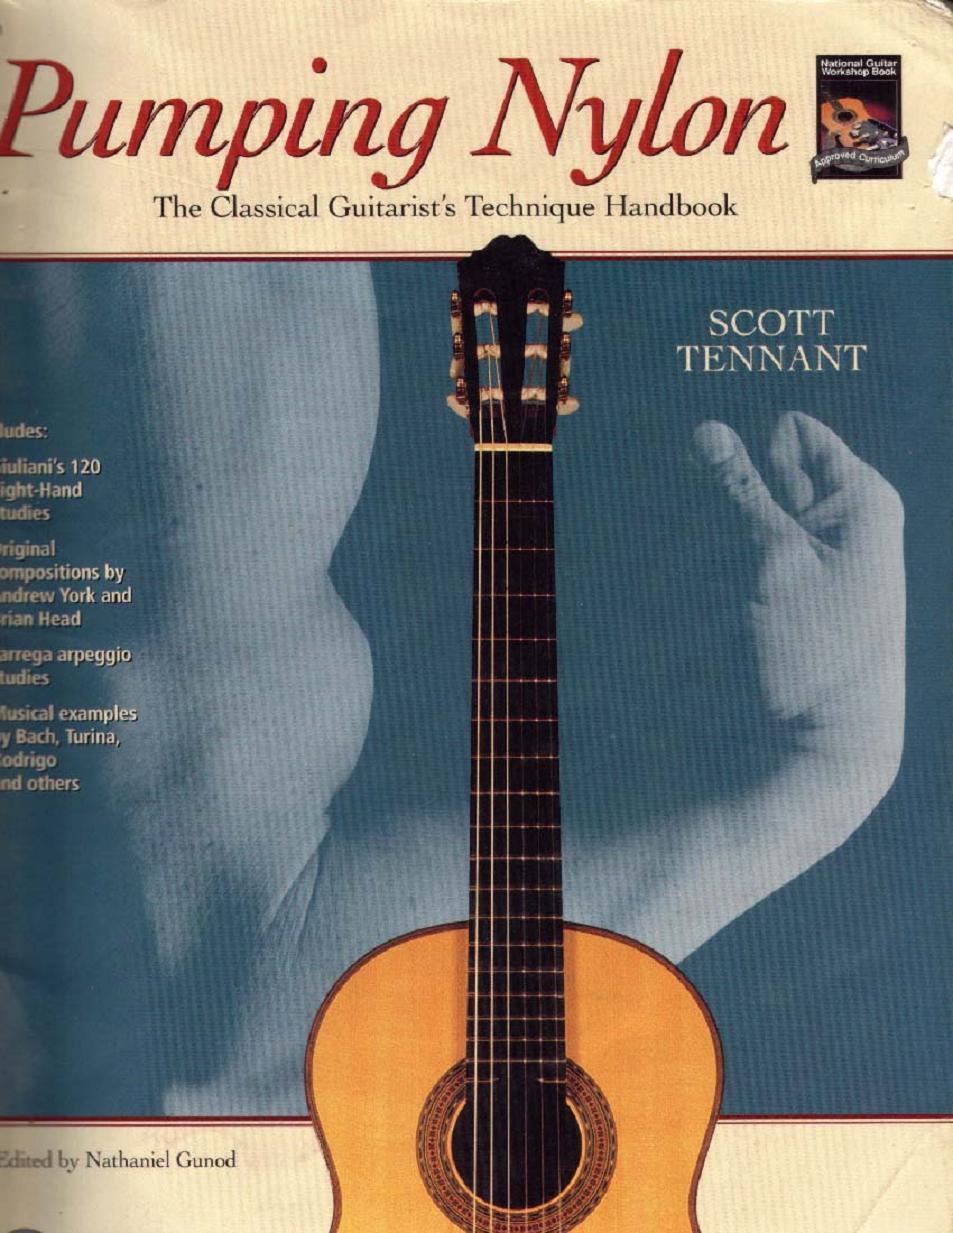 Scott Tennant - Pumping Nylon (Classical Guitarist's Technical Handbook)